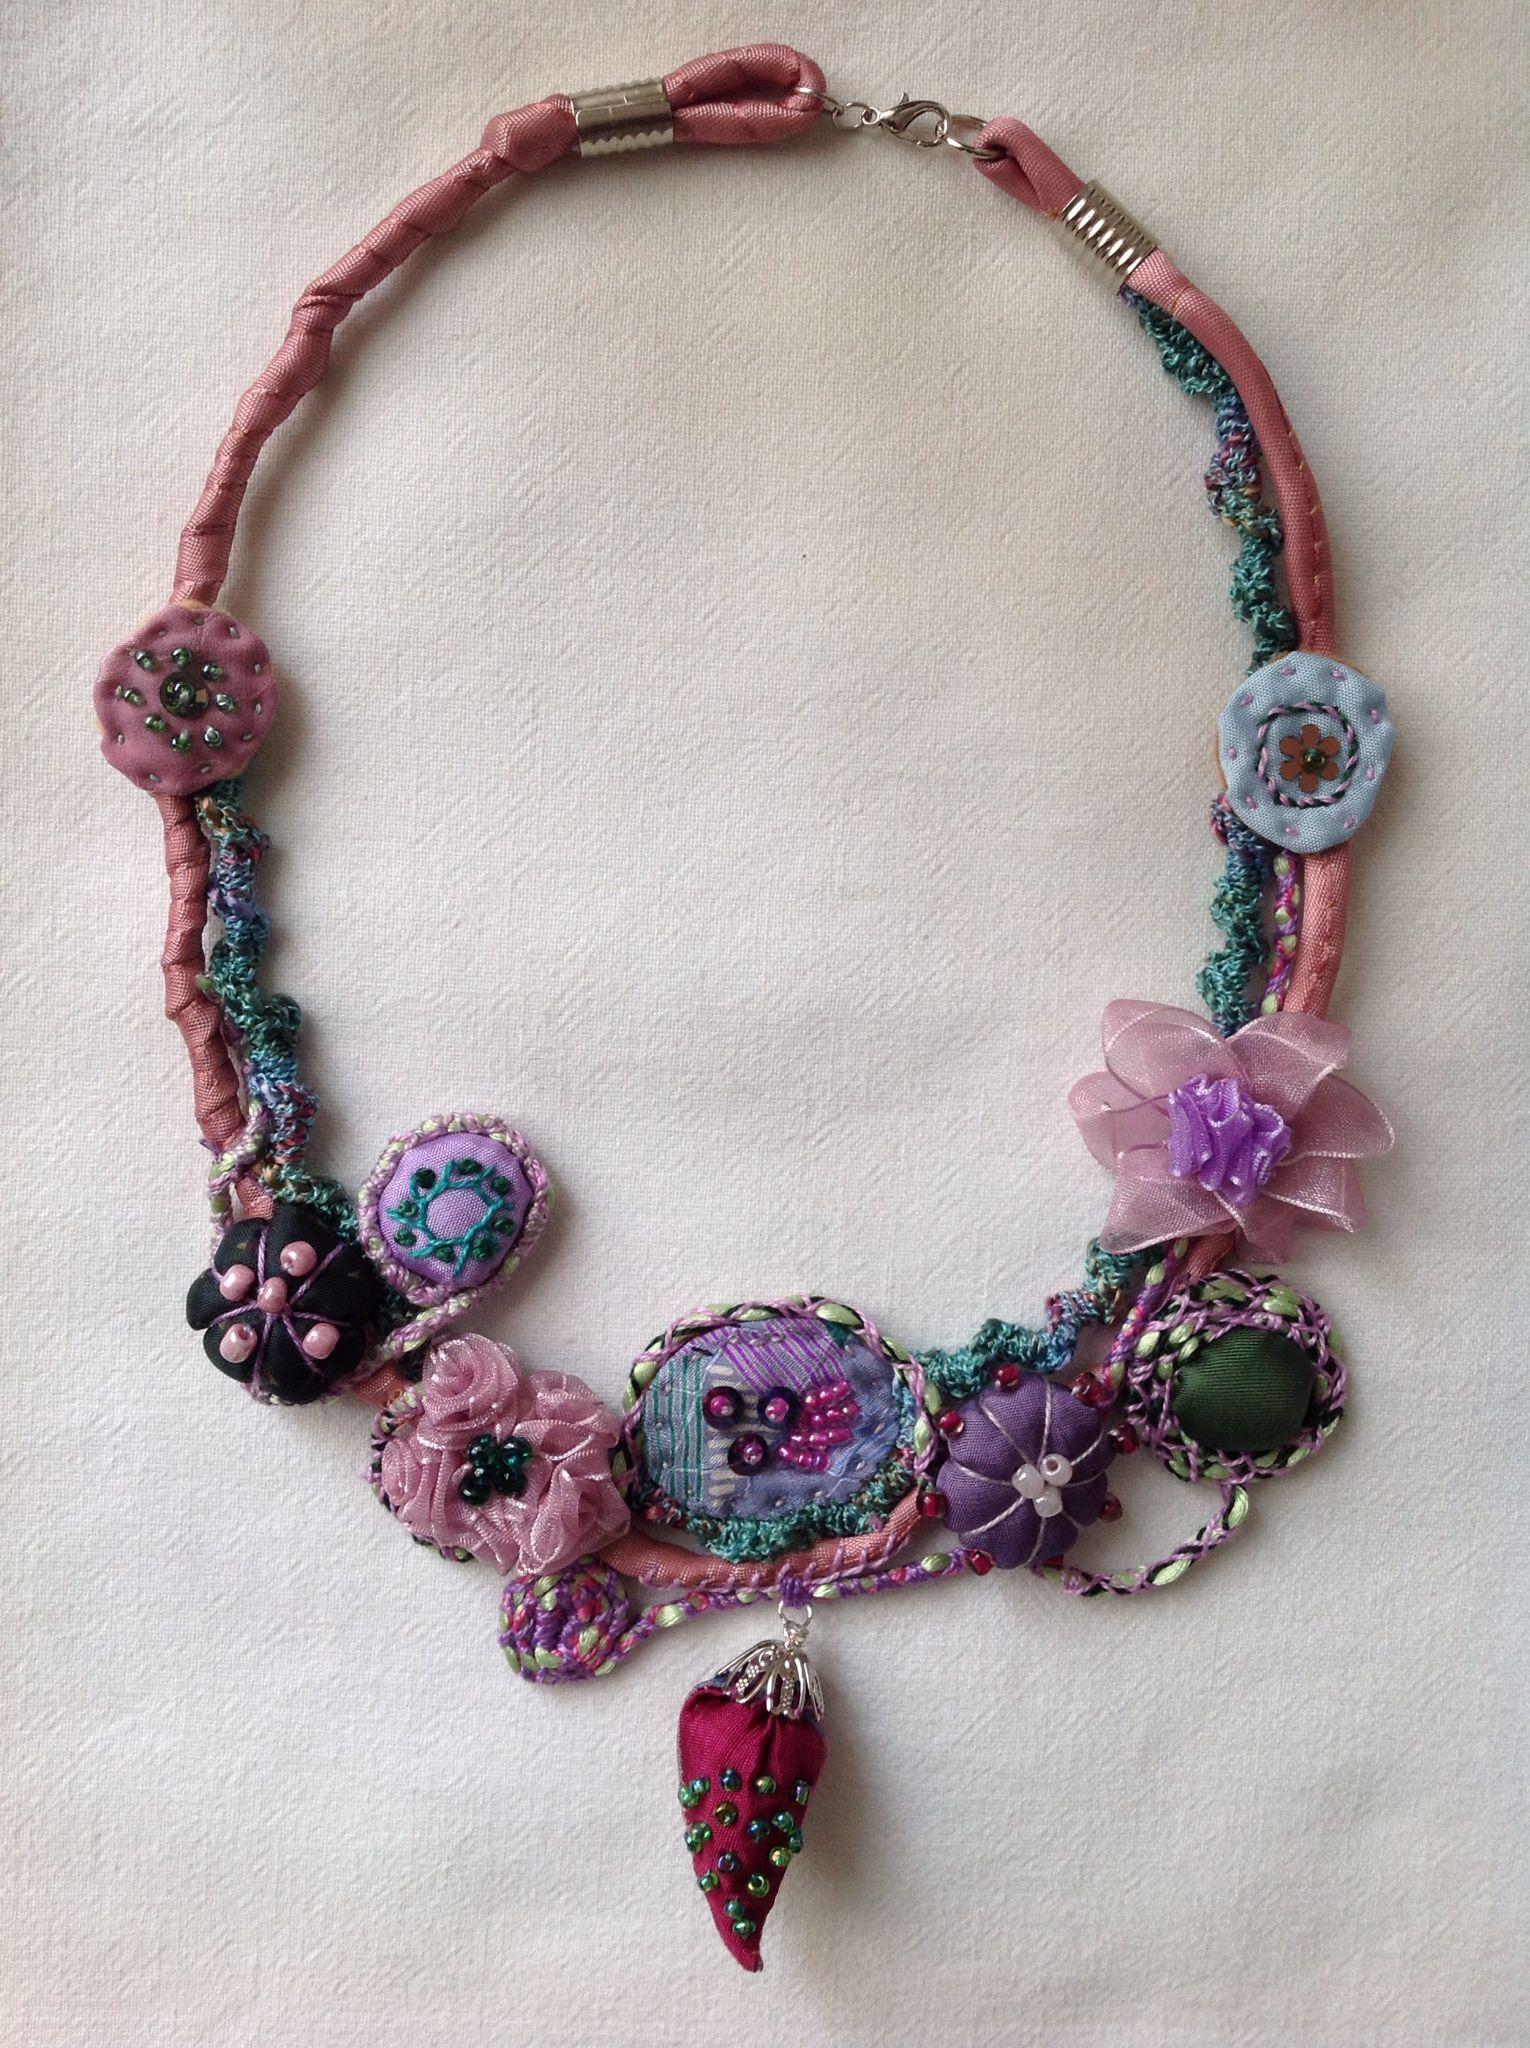 Necklace 09. by Marinela Kozelj | My Necklaces | Pinterest ...